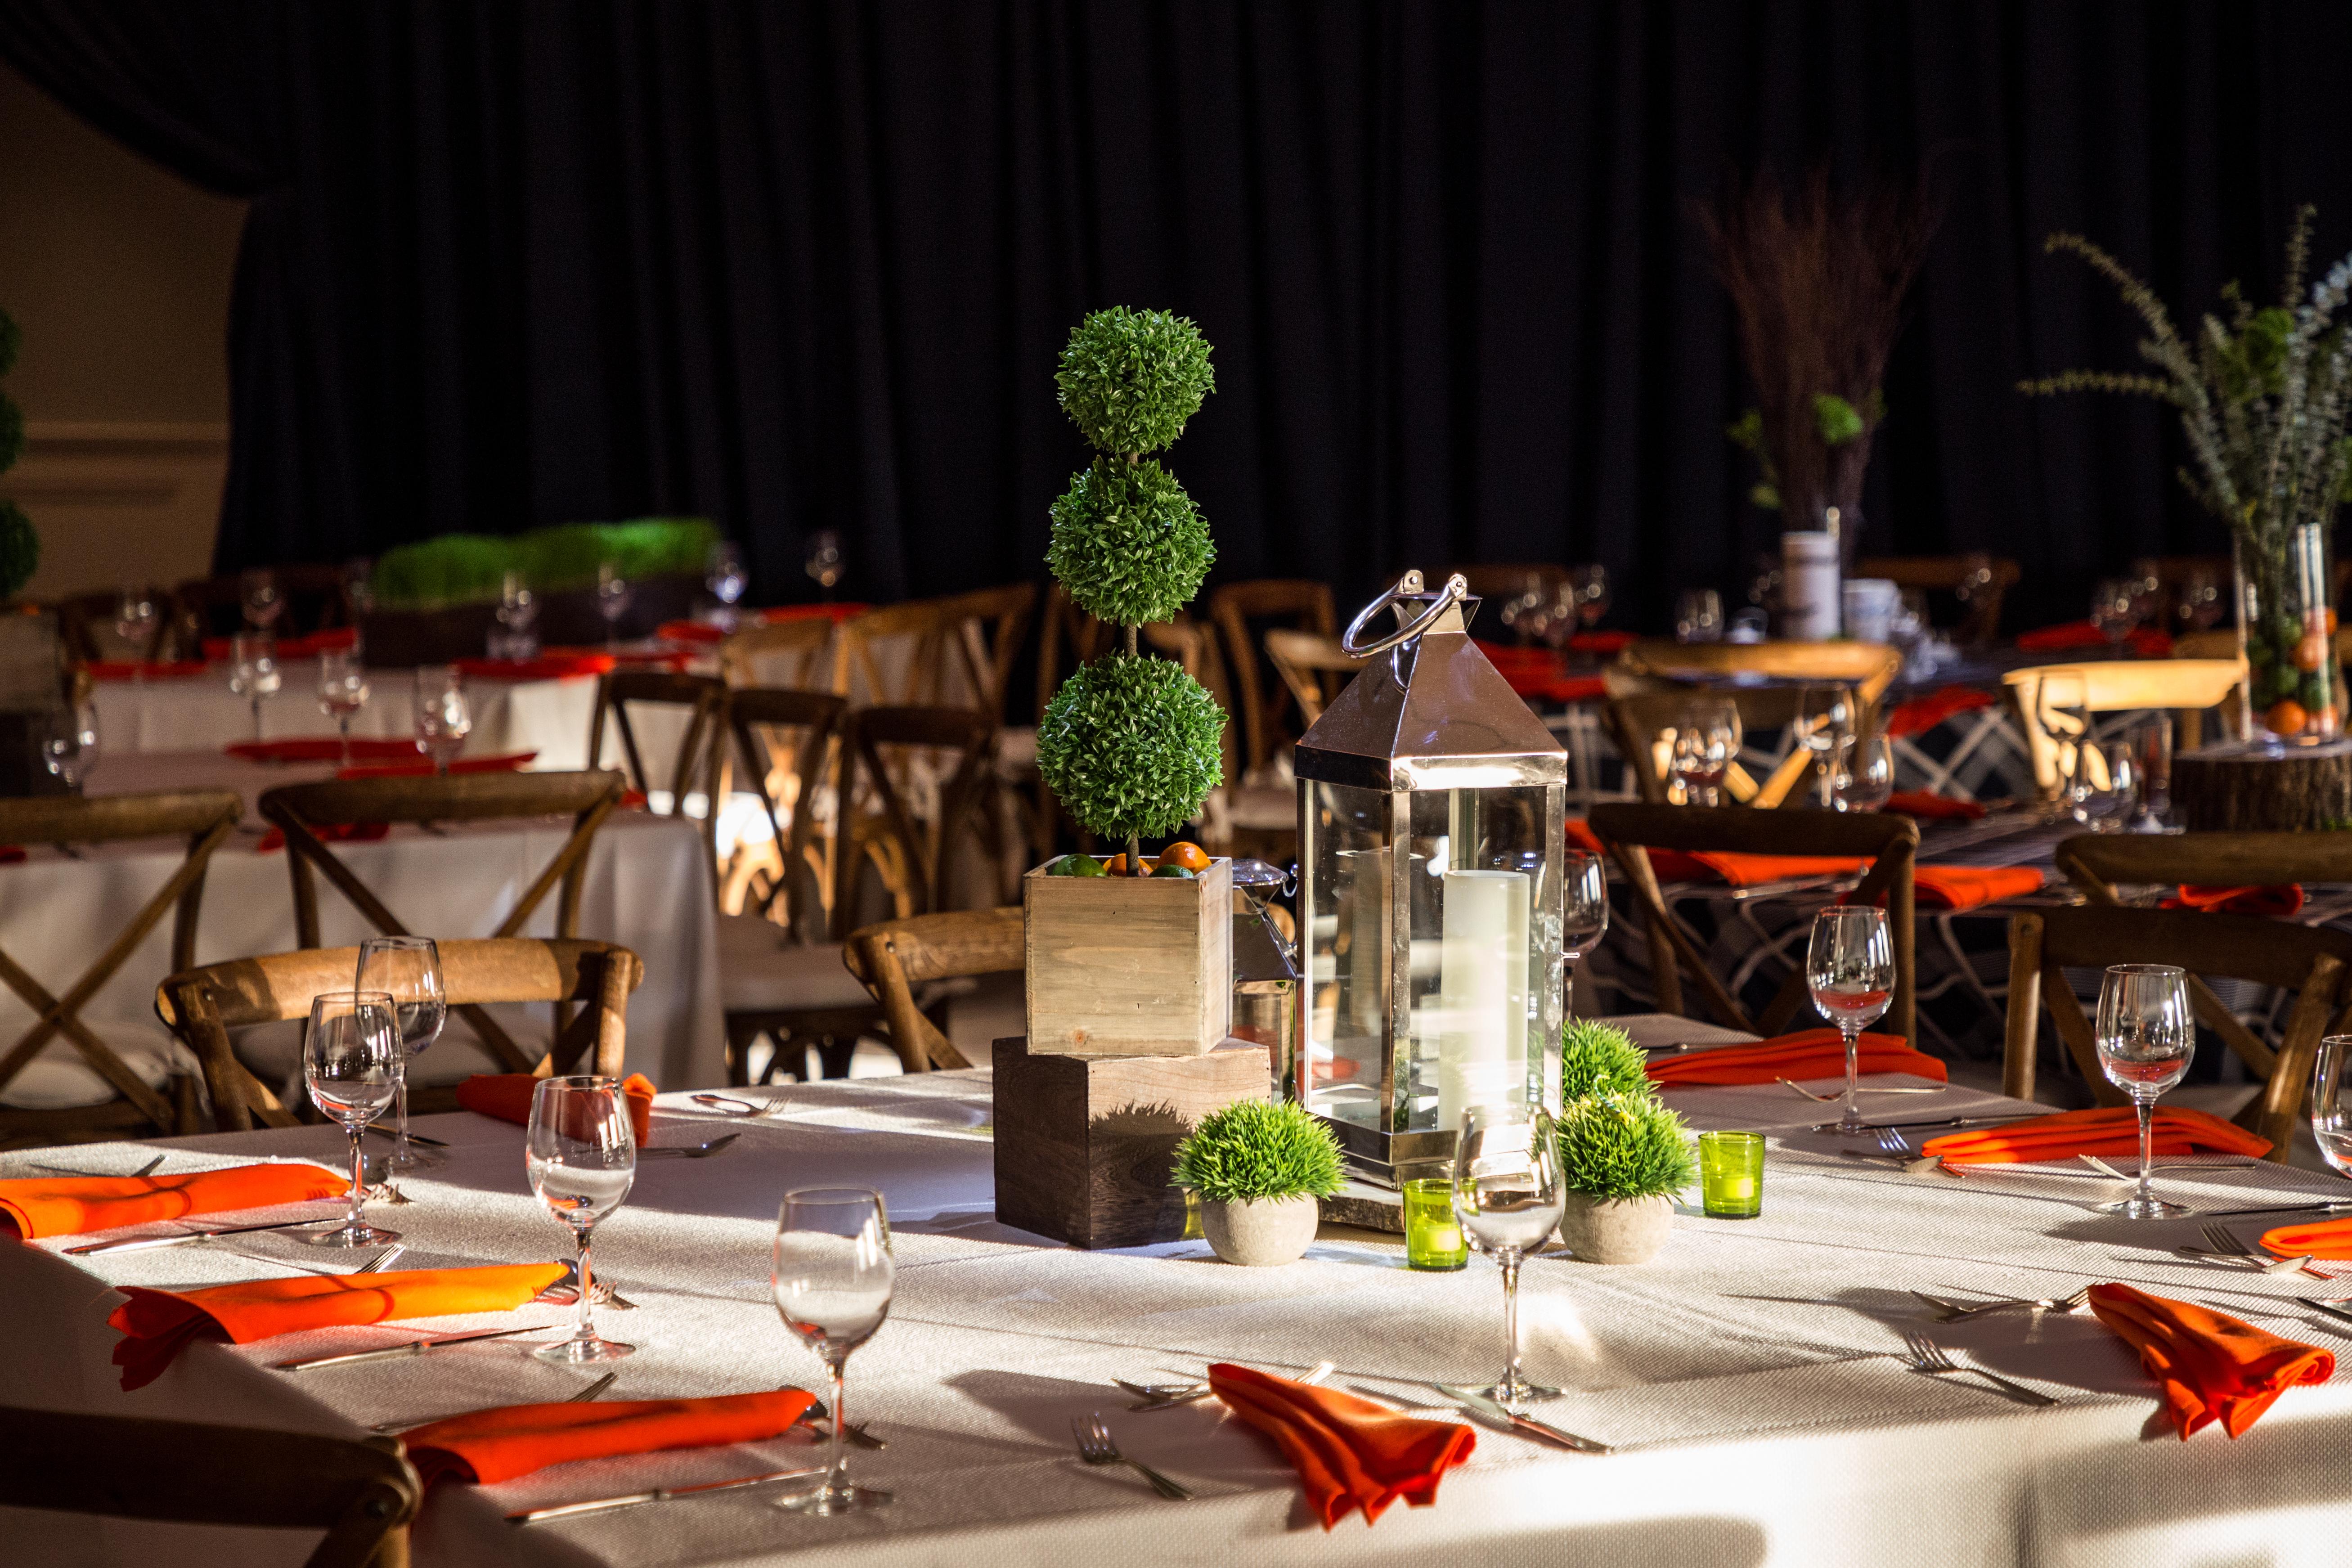 Indoor Backyard Picnic - iSparkleEvents